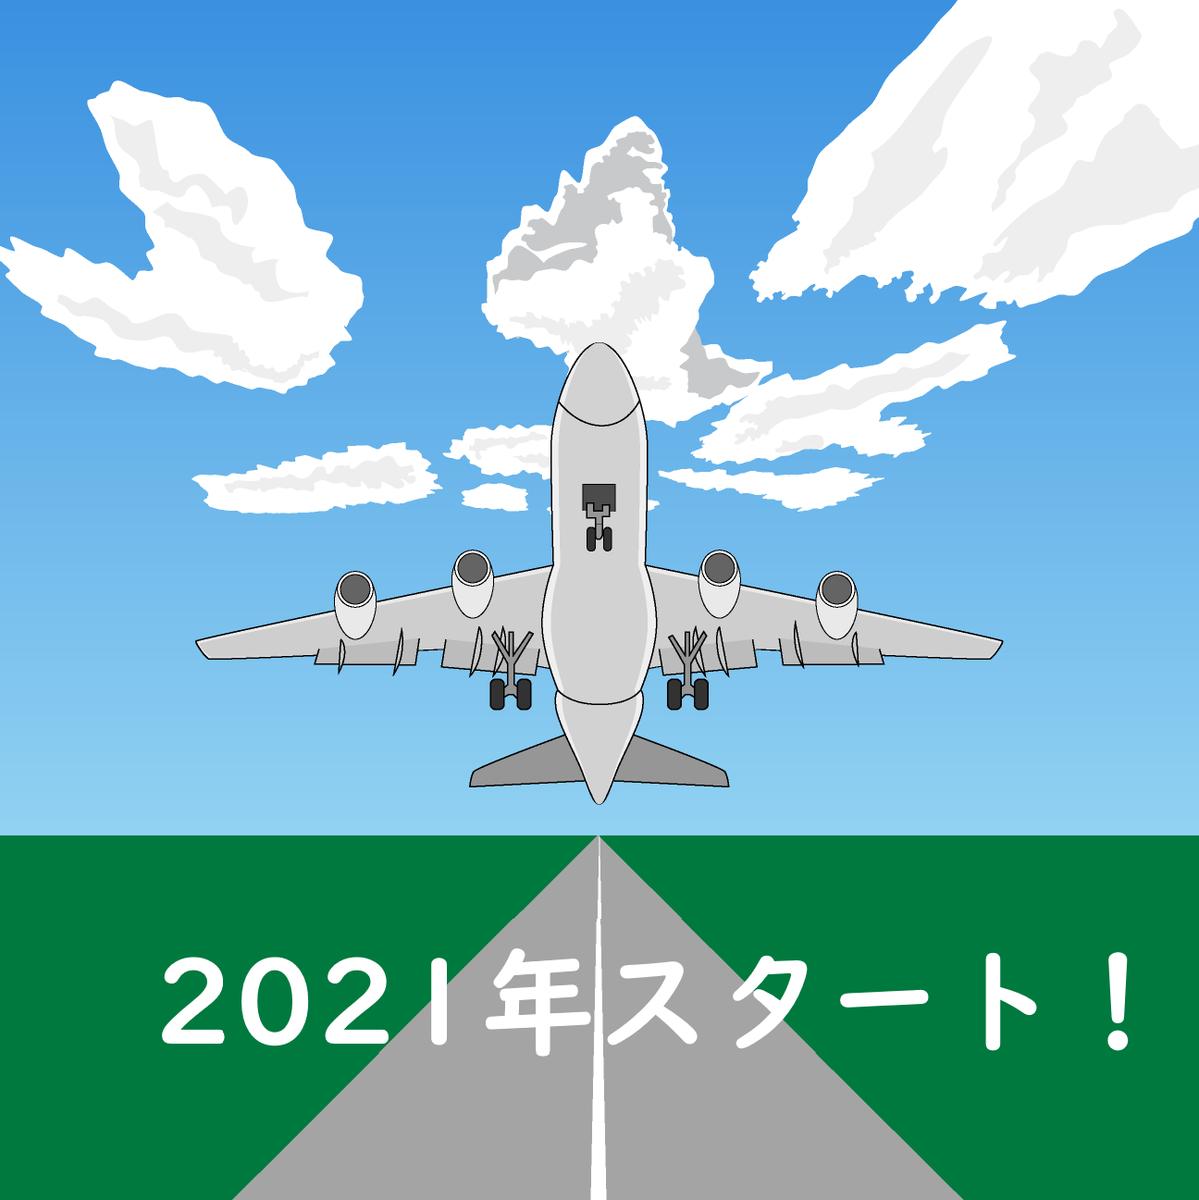 f:id:My-way-life:20210107221431p:plain